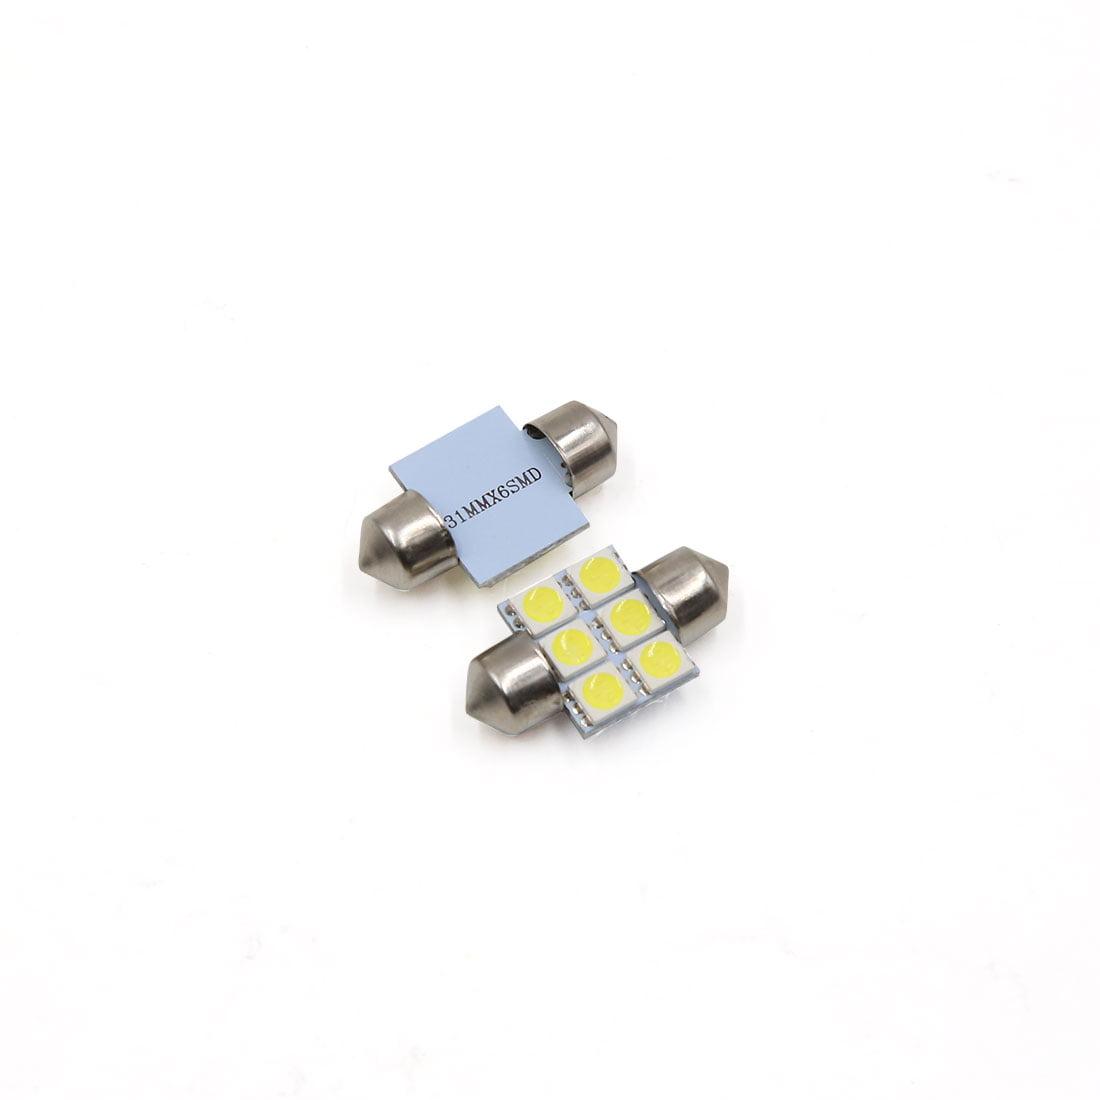 12pcs 31mm 6 LED 5050 SMD Festoon Dome Light Car Interior Bulb White 3022 DE3175 - image 2 of 3